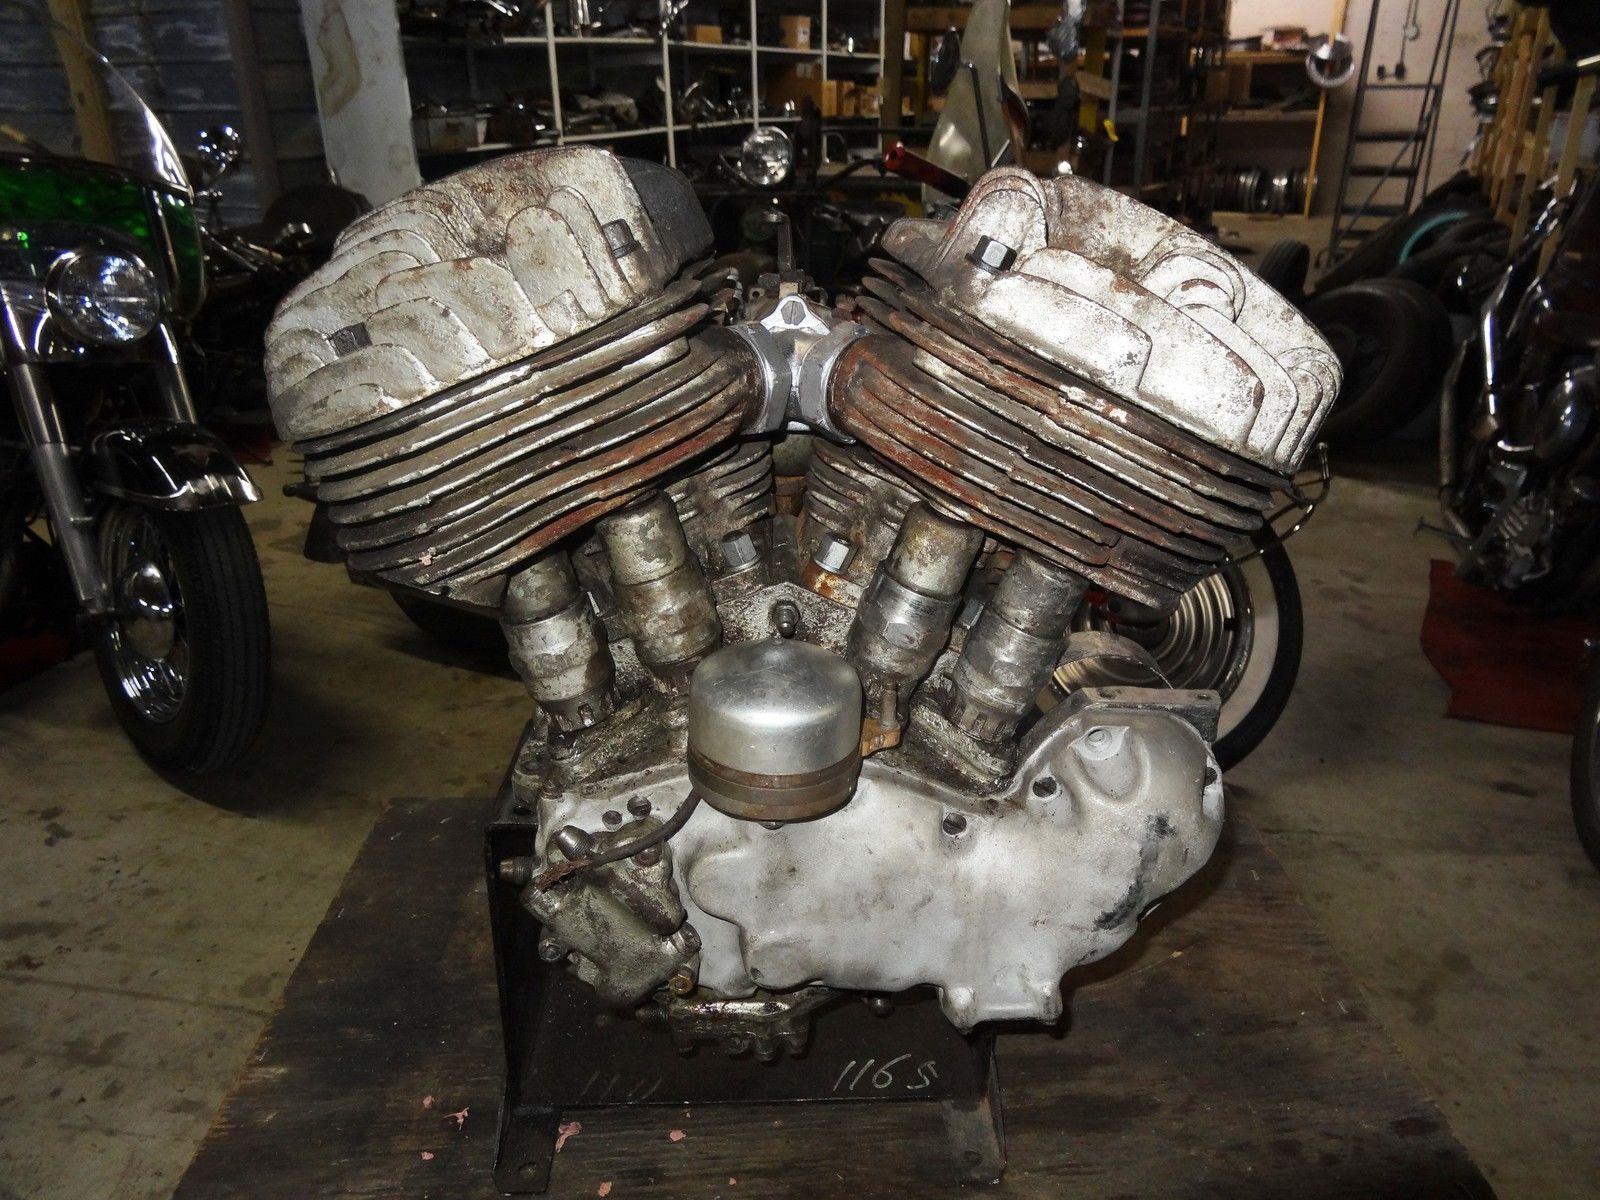 HARLEY DAVIDSON 1937 UL FLATHEAD ENGINE W/ TITLE ...